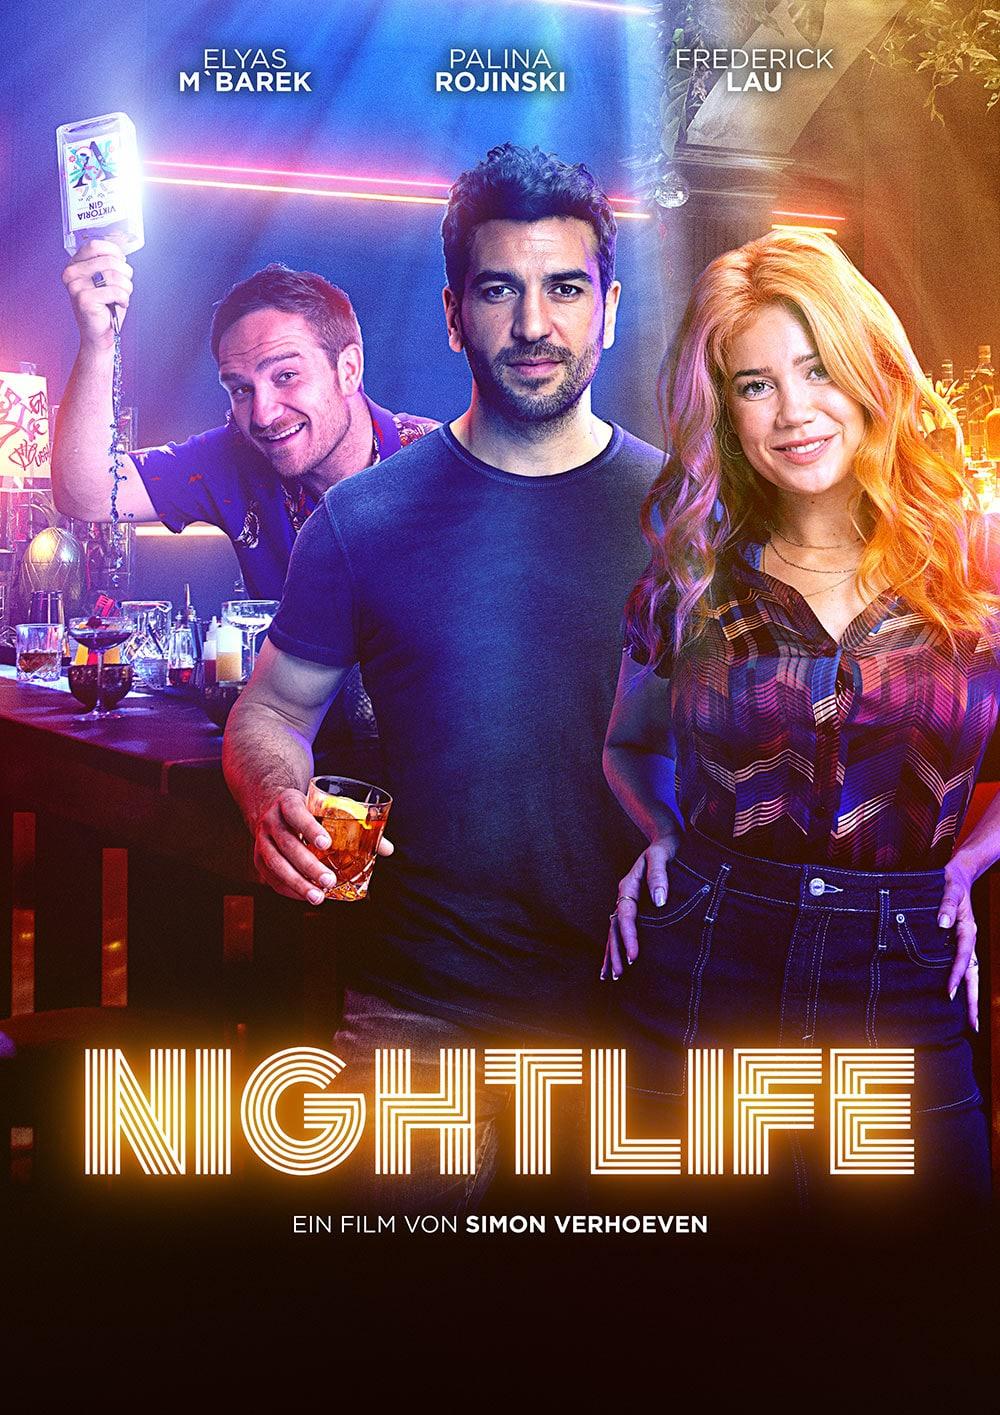 Nightlife Film - Alternative Artwork - Key Visual - 7